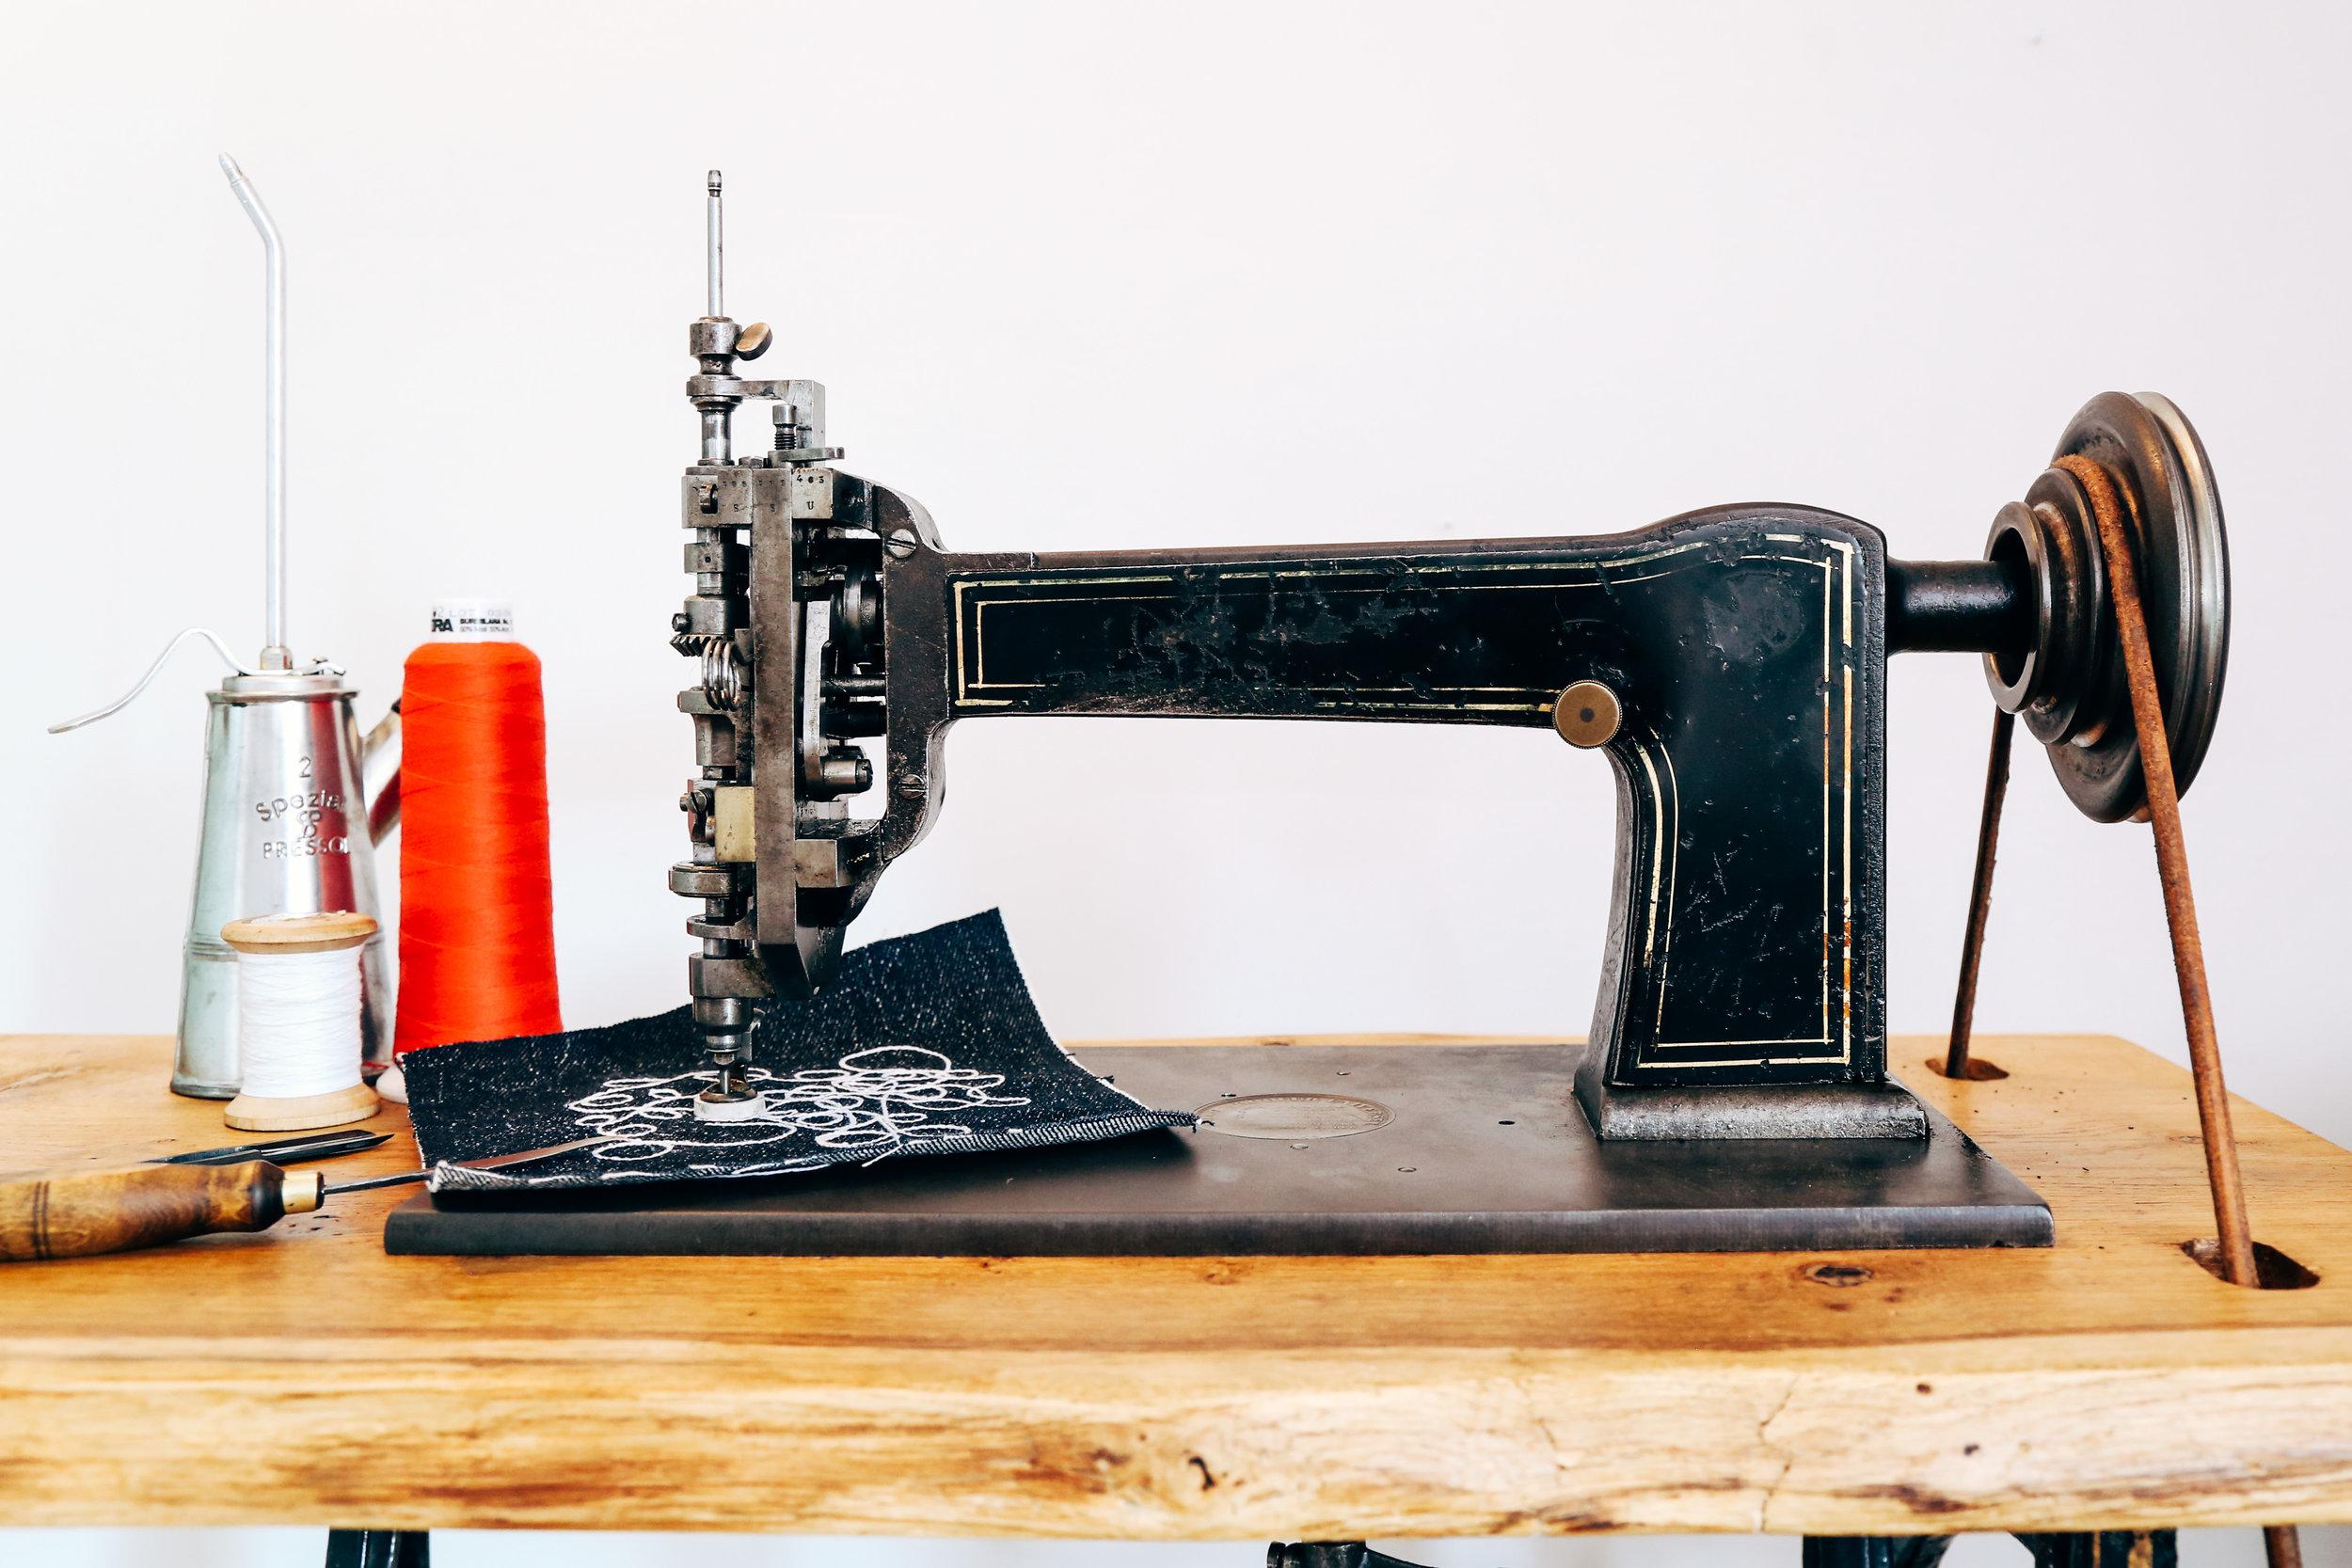 chainstitch-machine-cornely-a-embroidery-singer-114w103-saintchains.jpg